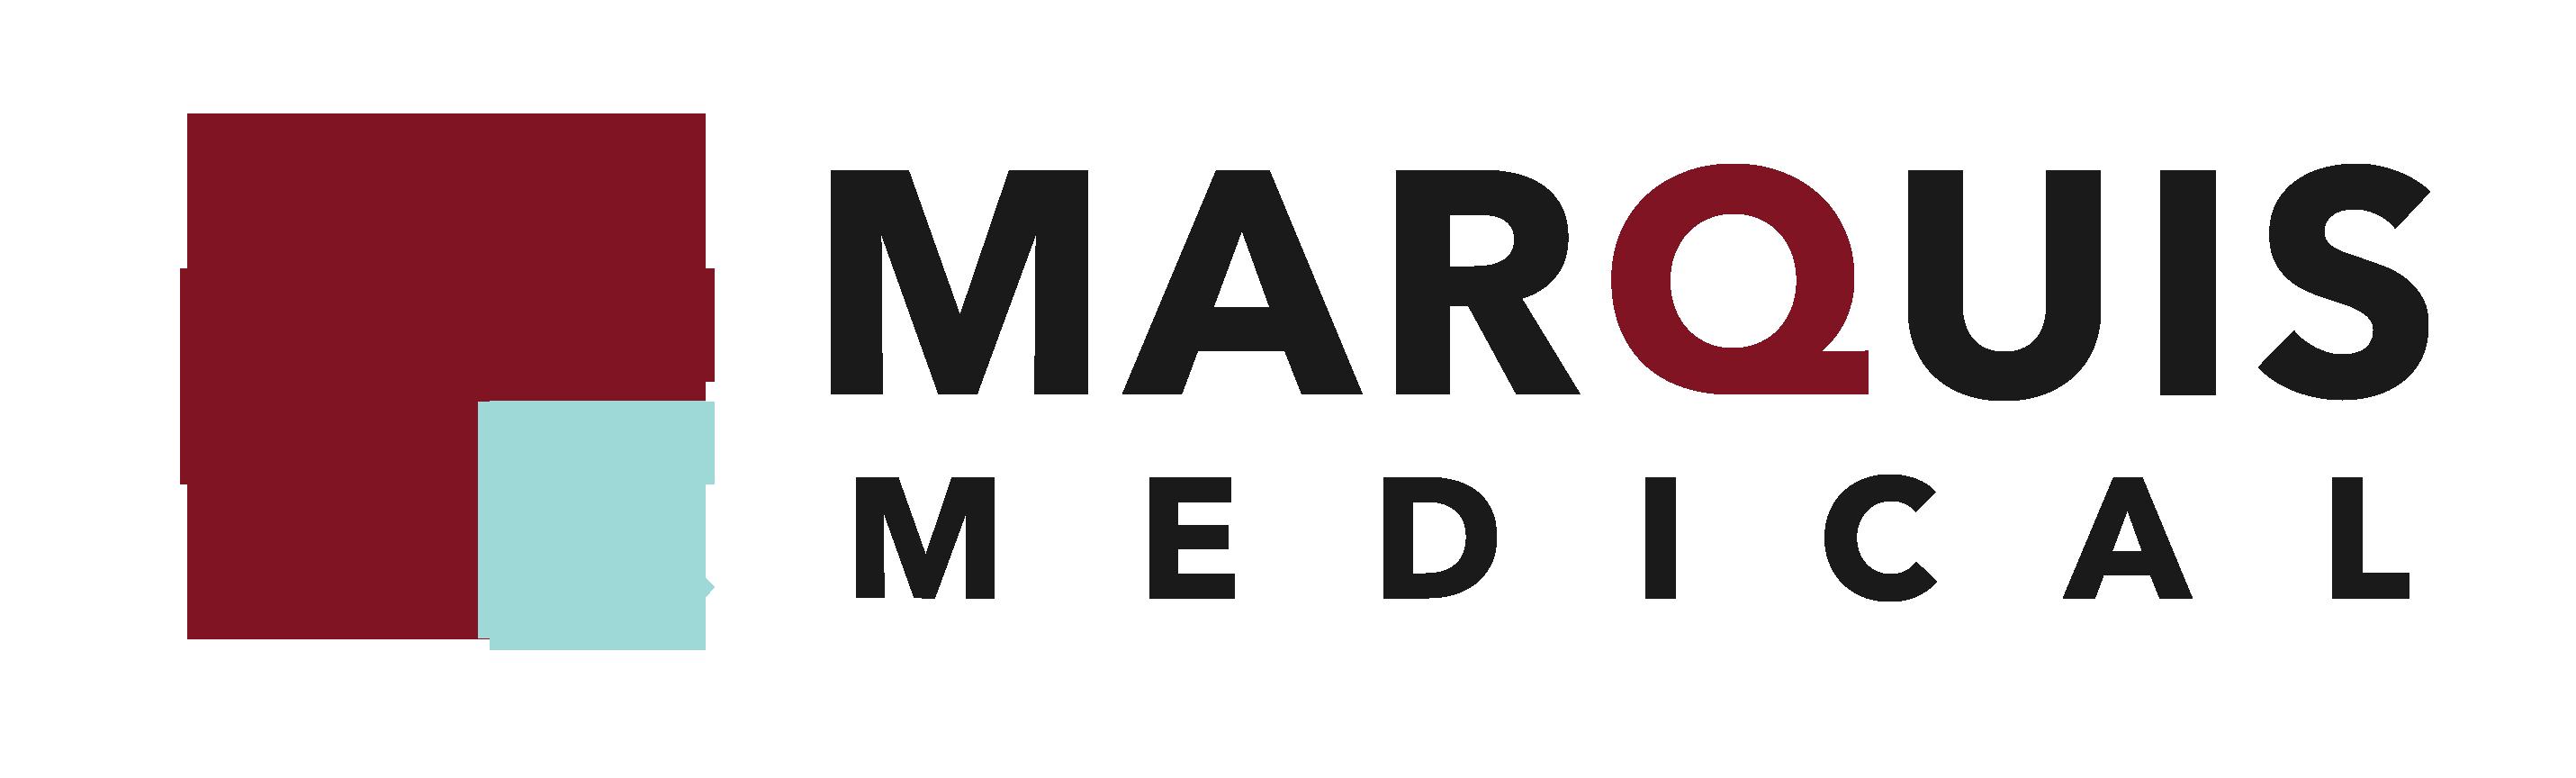 Marquis Medical Center Announces Women's History Month Initiative Celebration